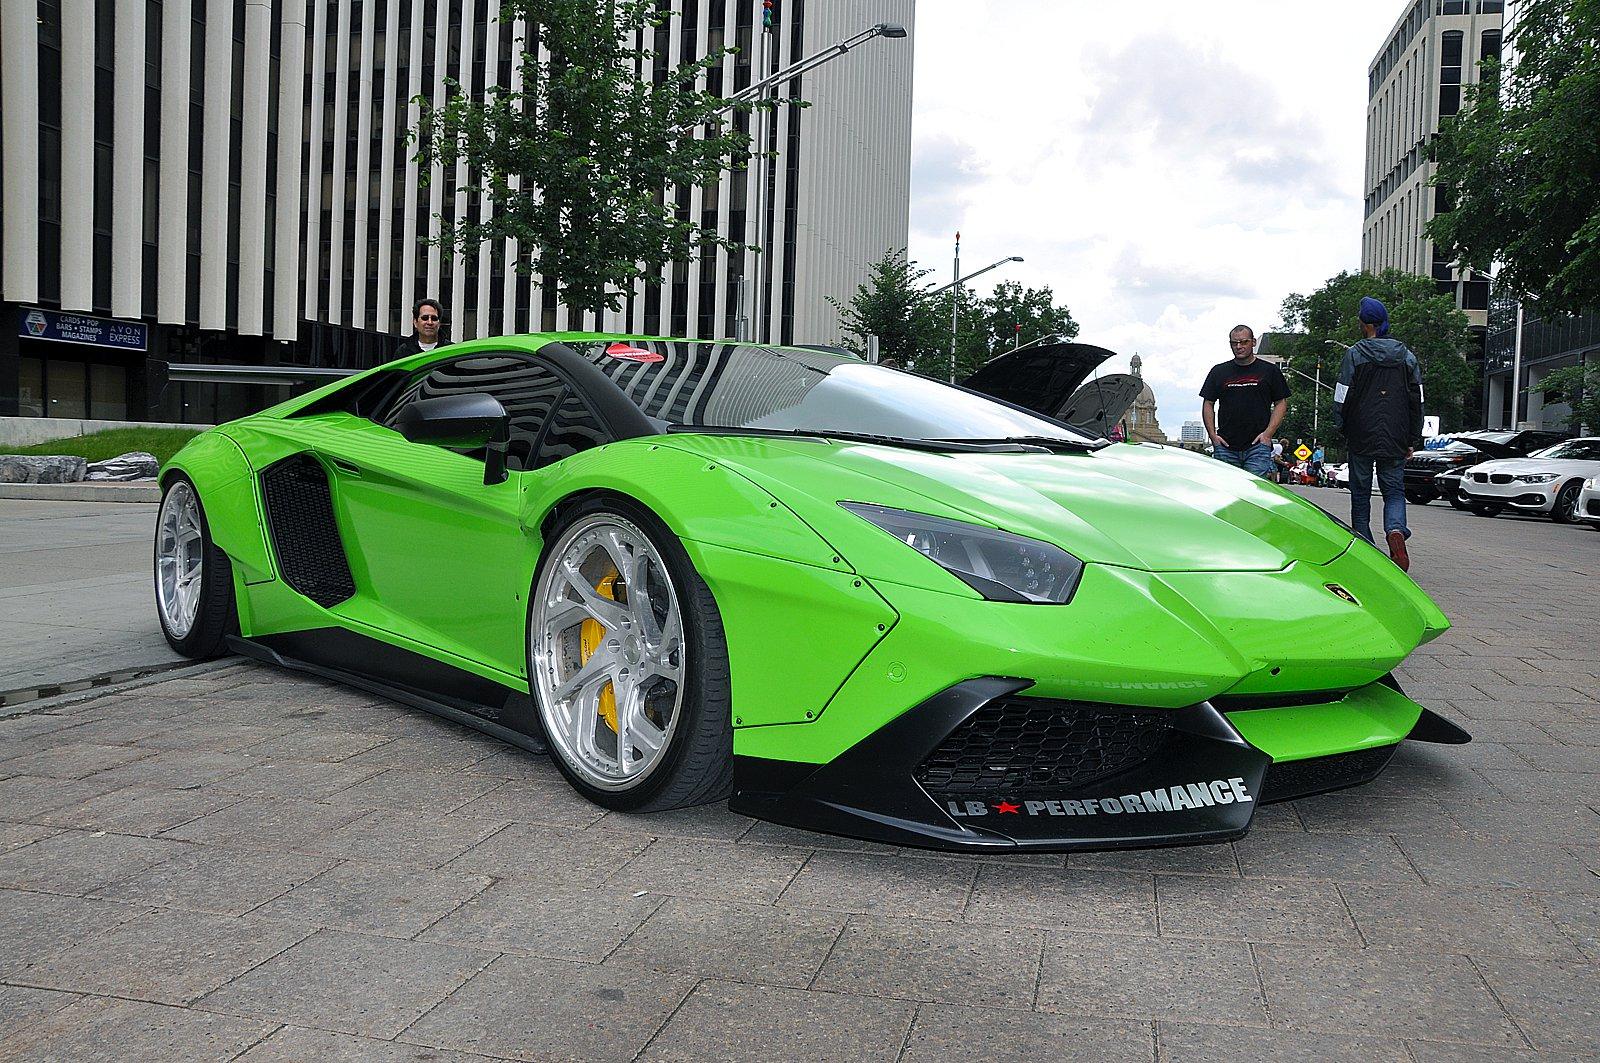 Cars Don T Get Much Crazier Than A Lime Green Liberty Walk Lamborghini Aventador